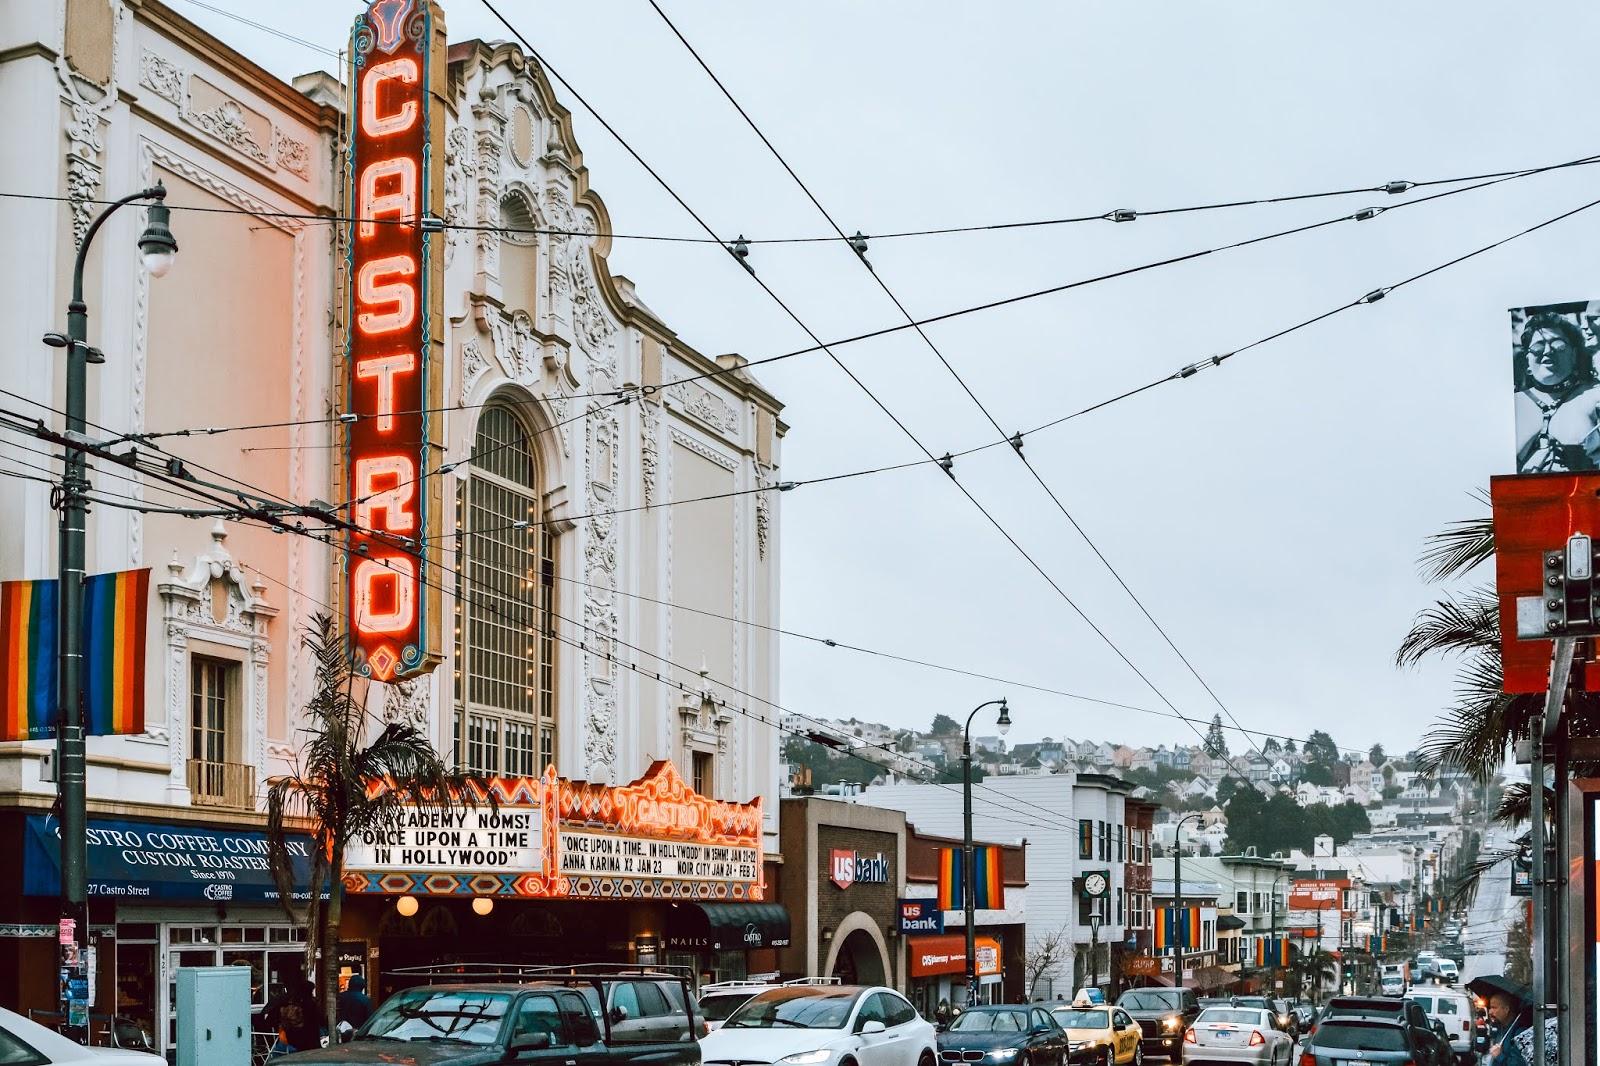 Castro California